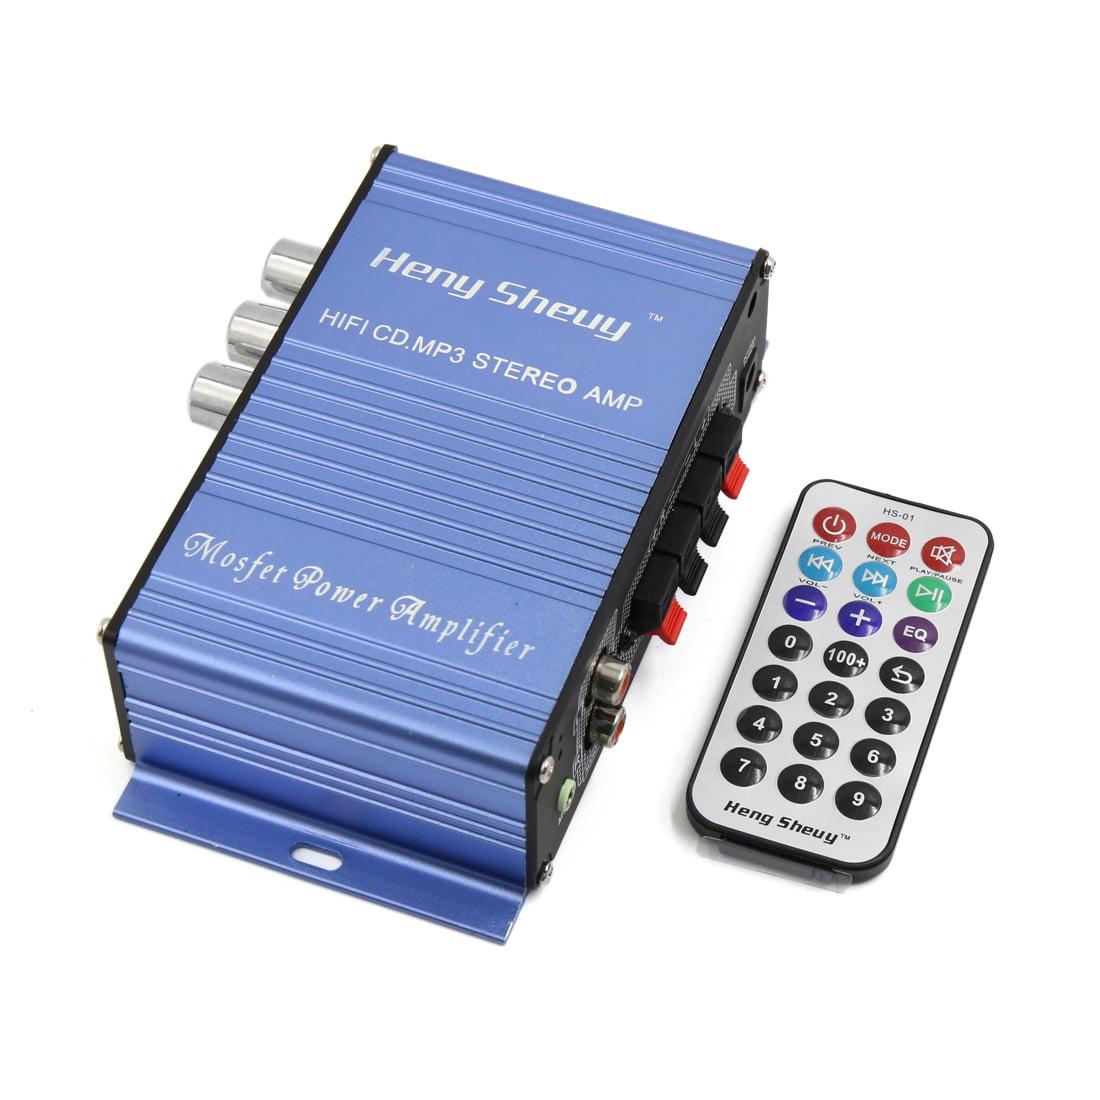 DC 12V FM Radio USB Power Amplifier Digital Audio Player Blue for Car Motorcycle